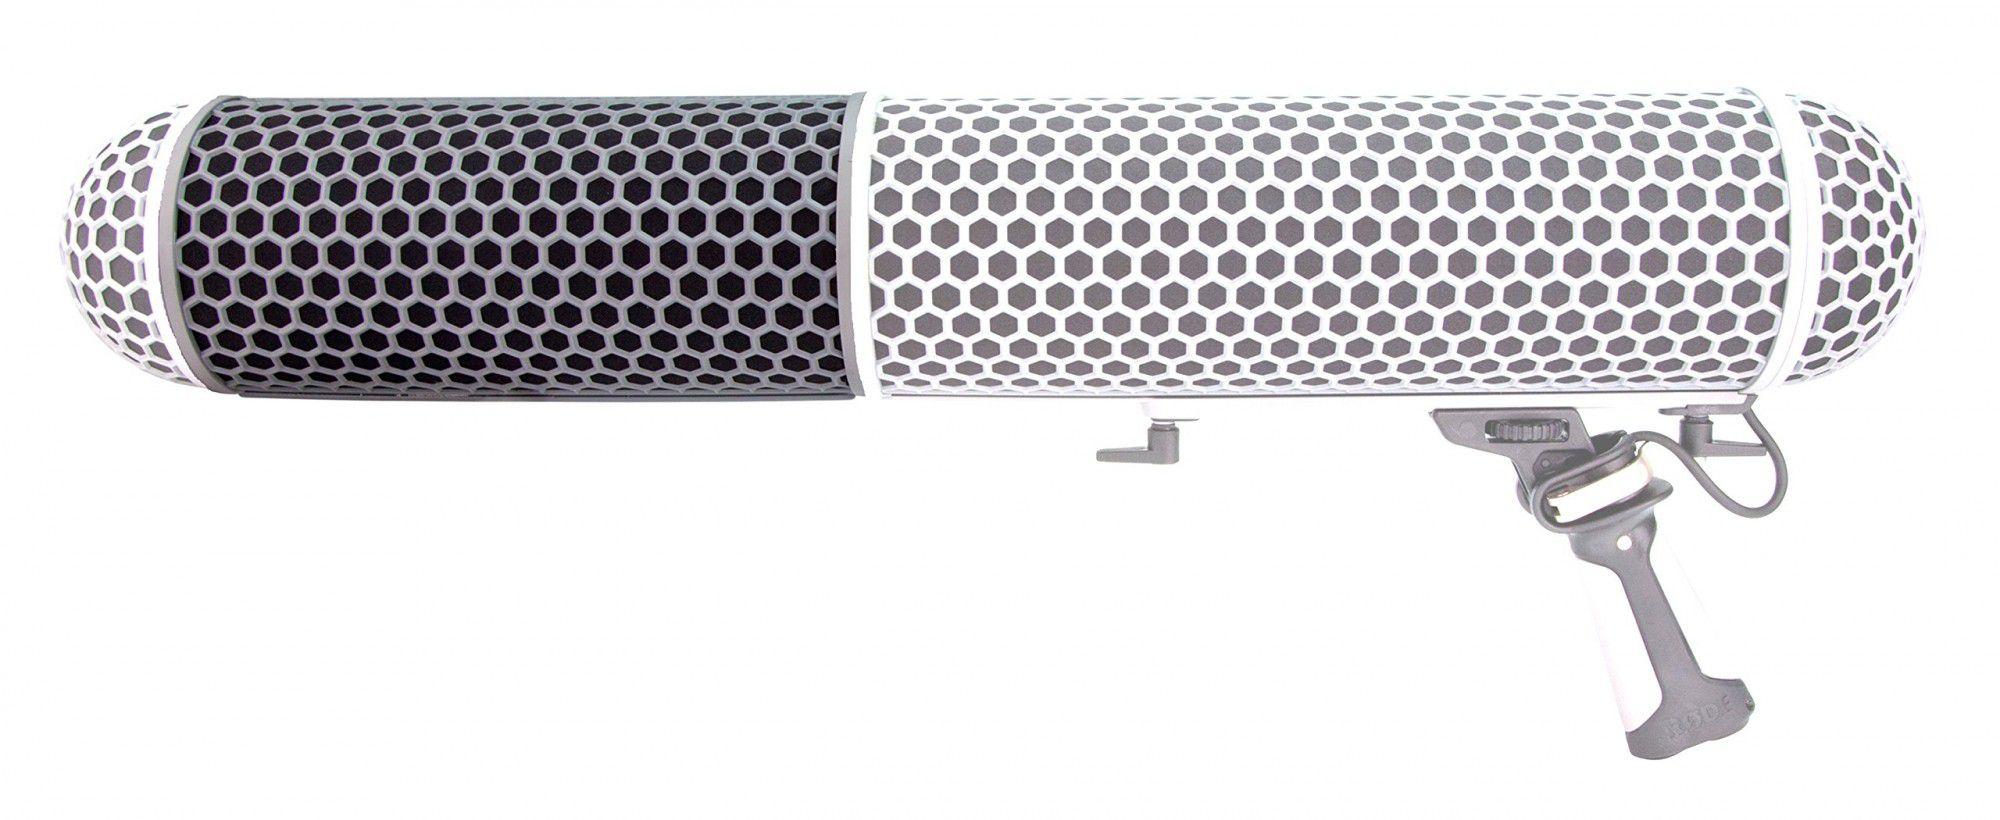 Kit com extensão de 25 cm para Zepplin Rode Blimp RODE BLIMP EXTENSION